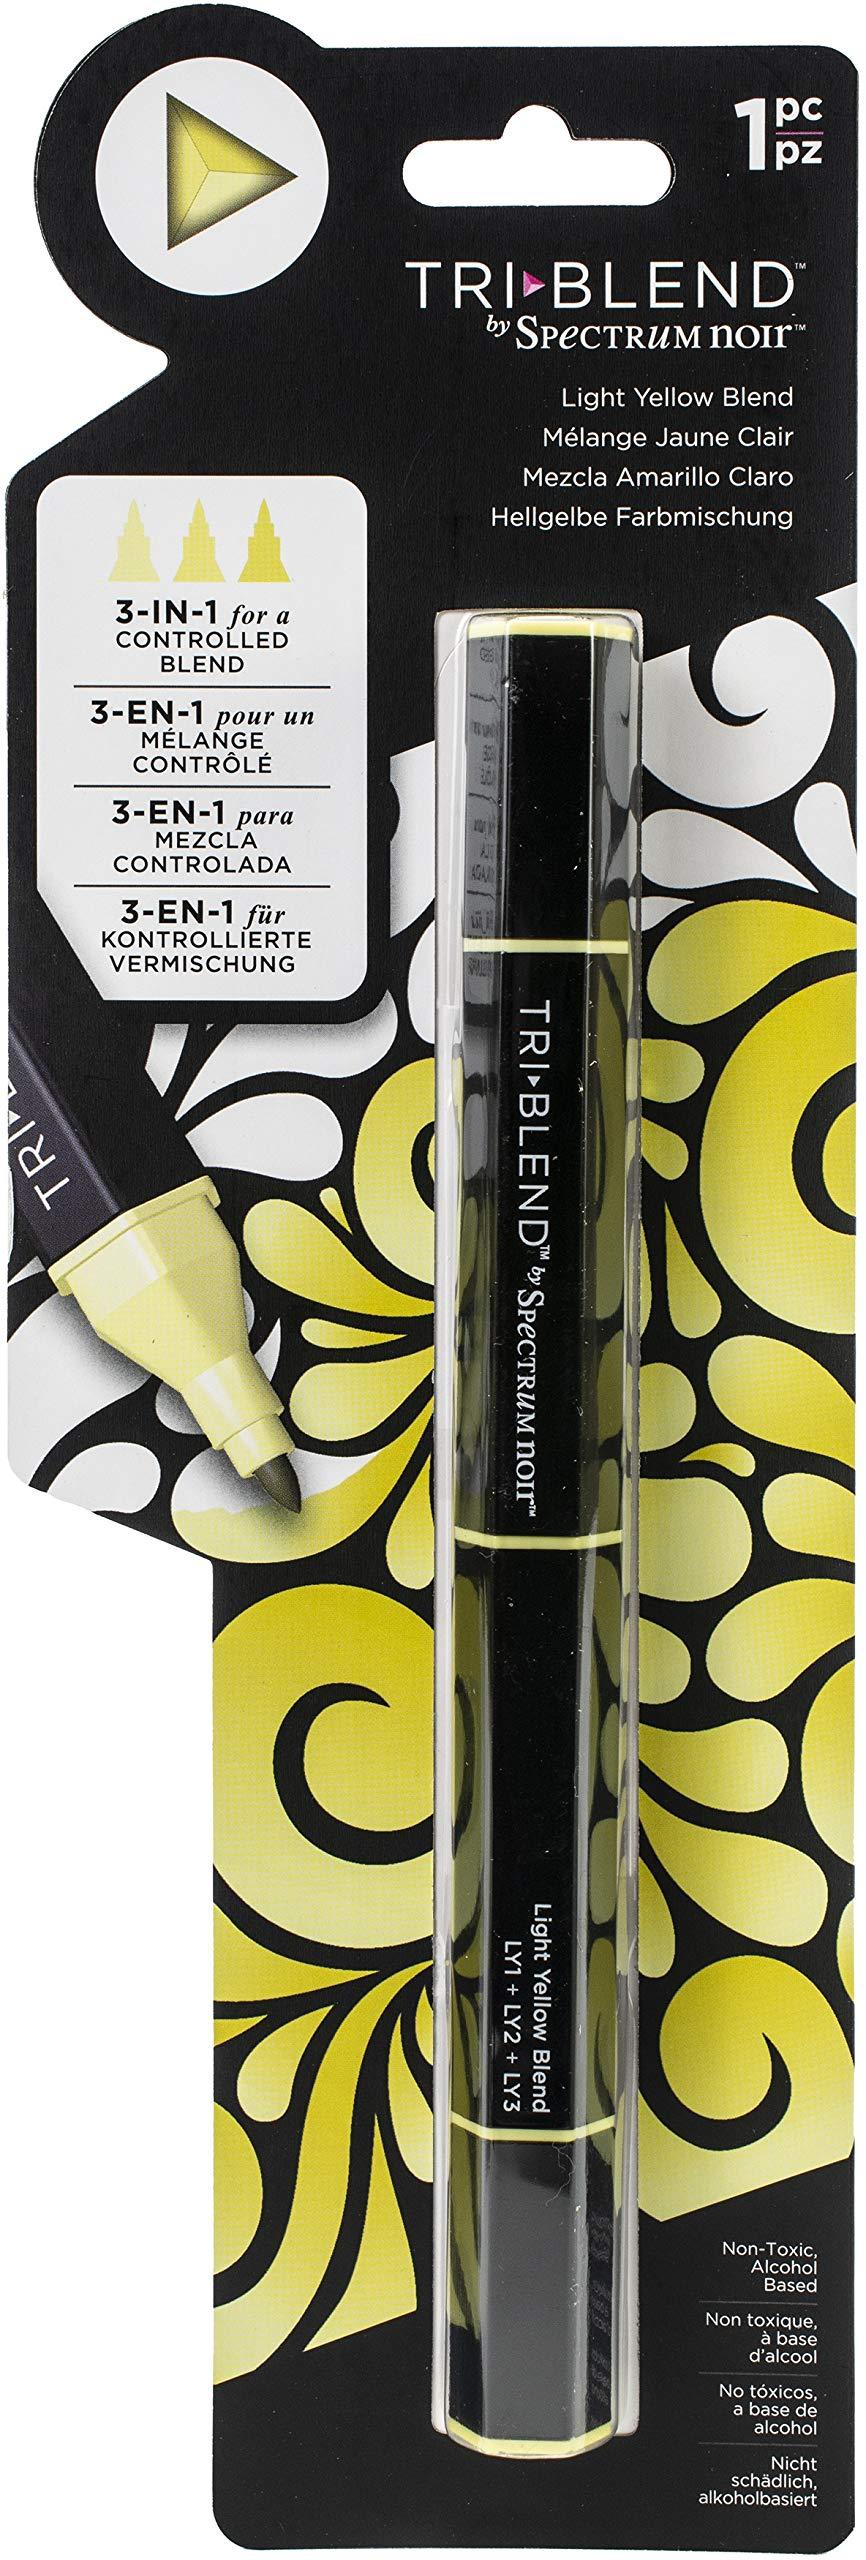 Spectrum Noir Blend Triblend Blendable Alcohol Marker 3 Colours in 1 Pen-Light Yellow